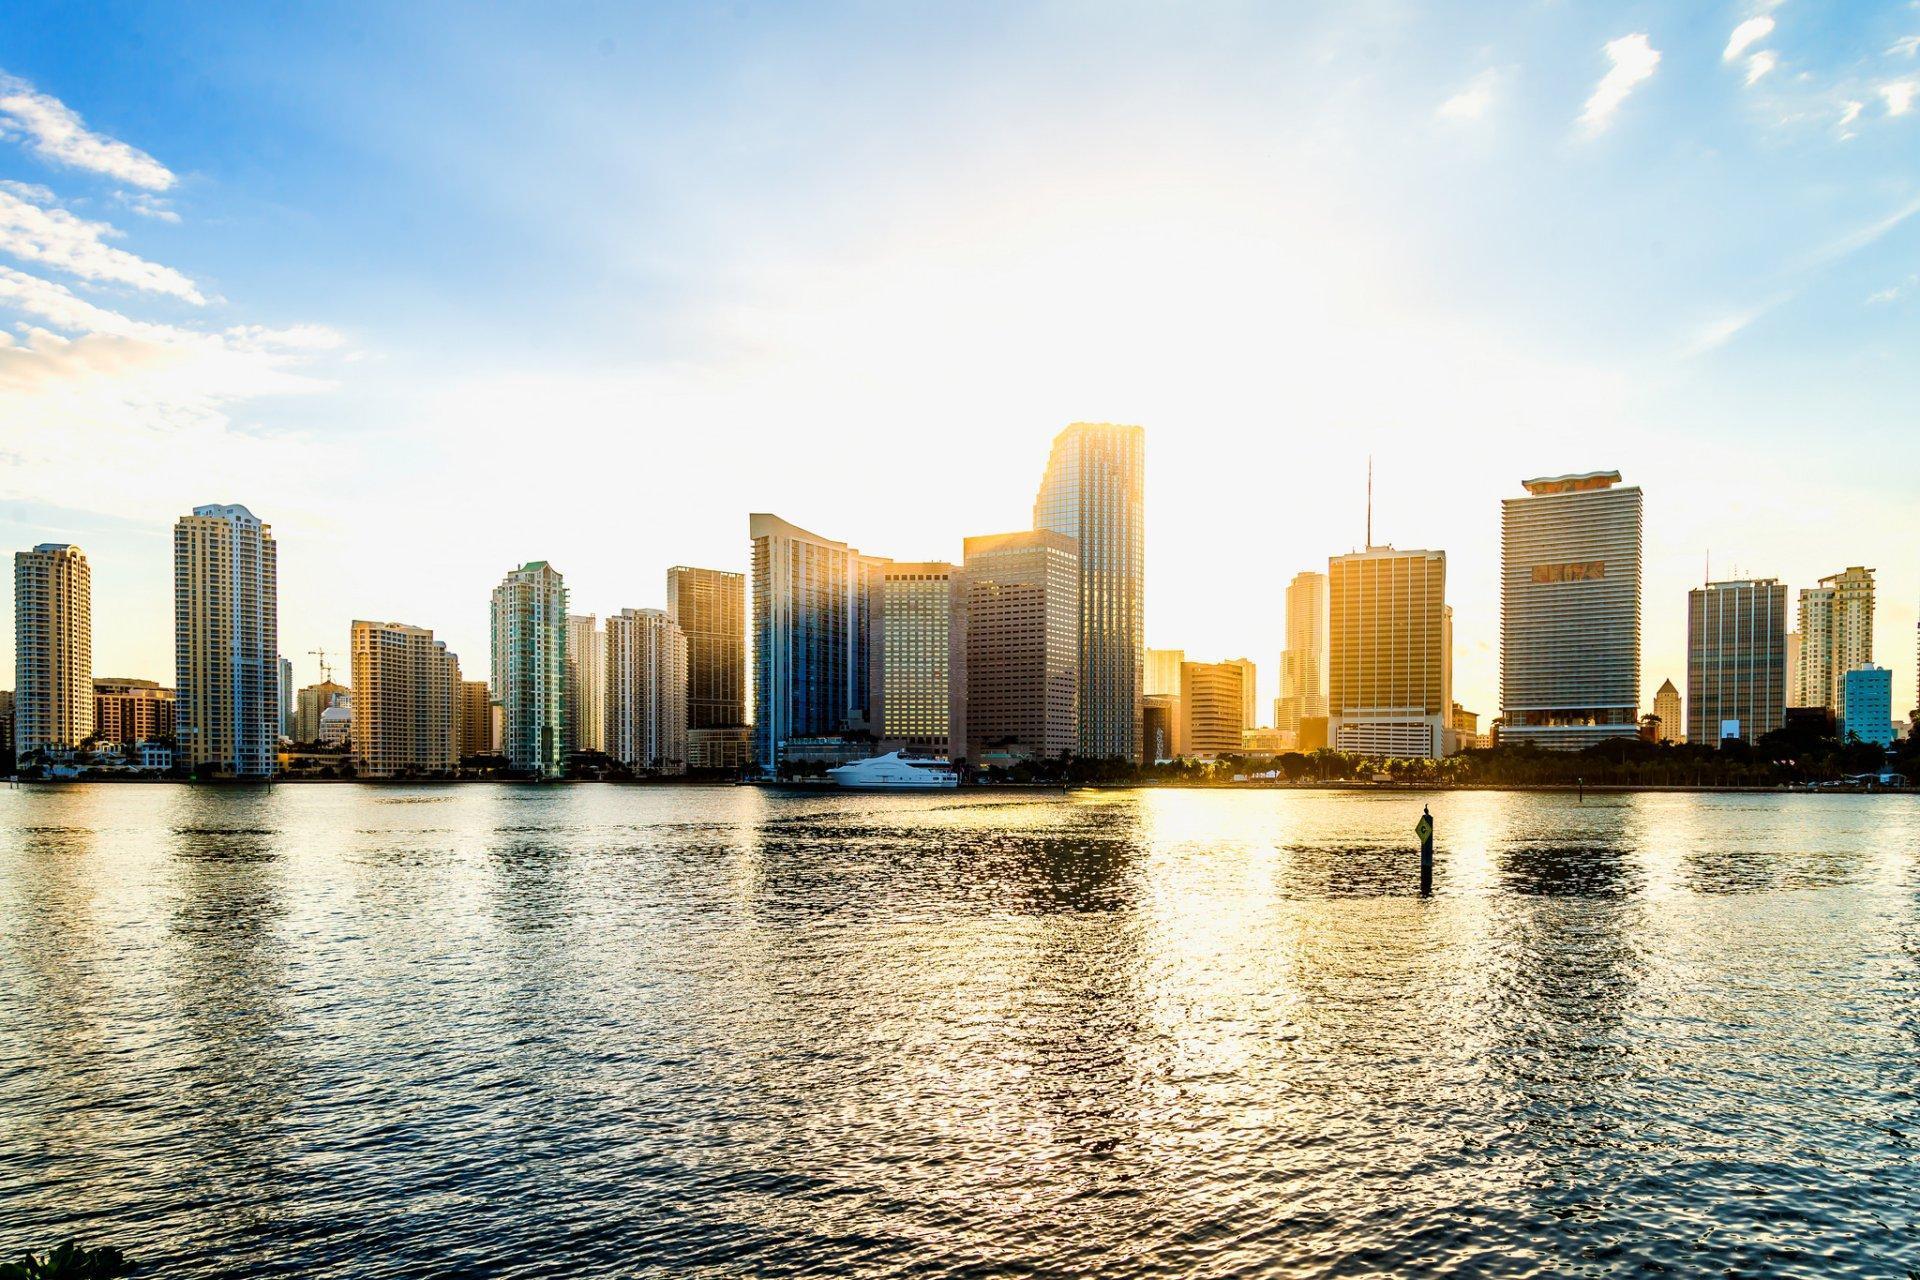 Fondos de Miami